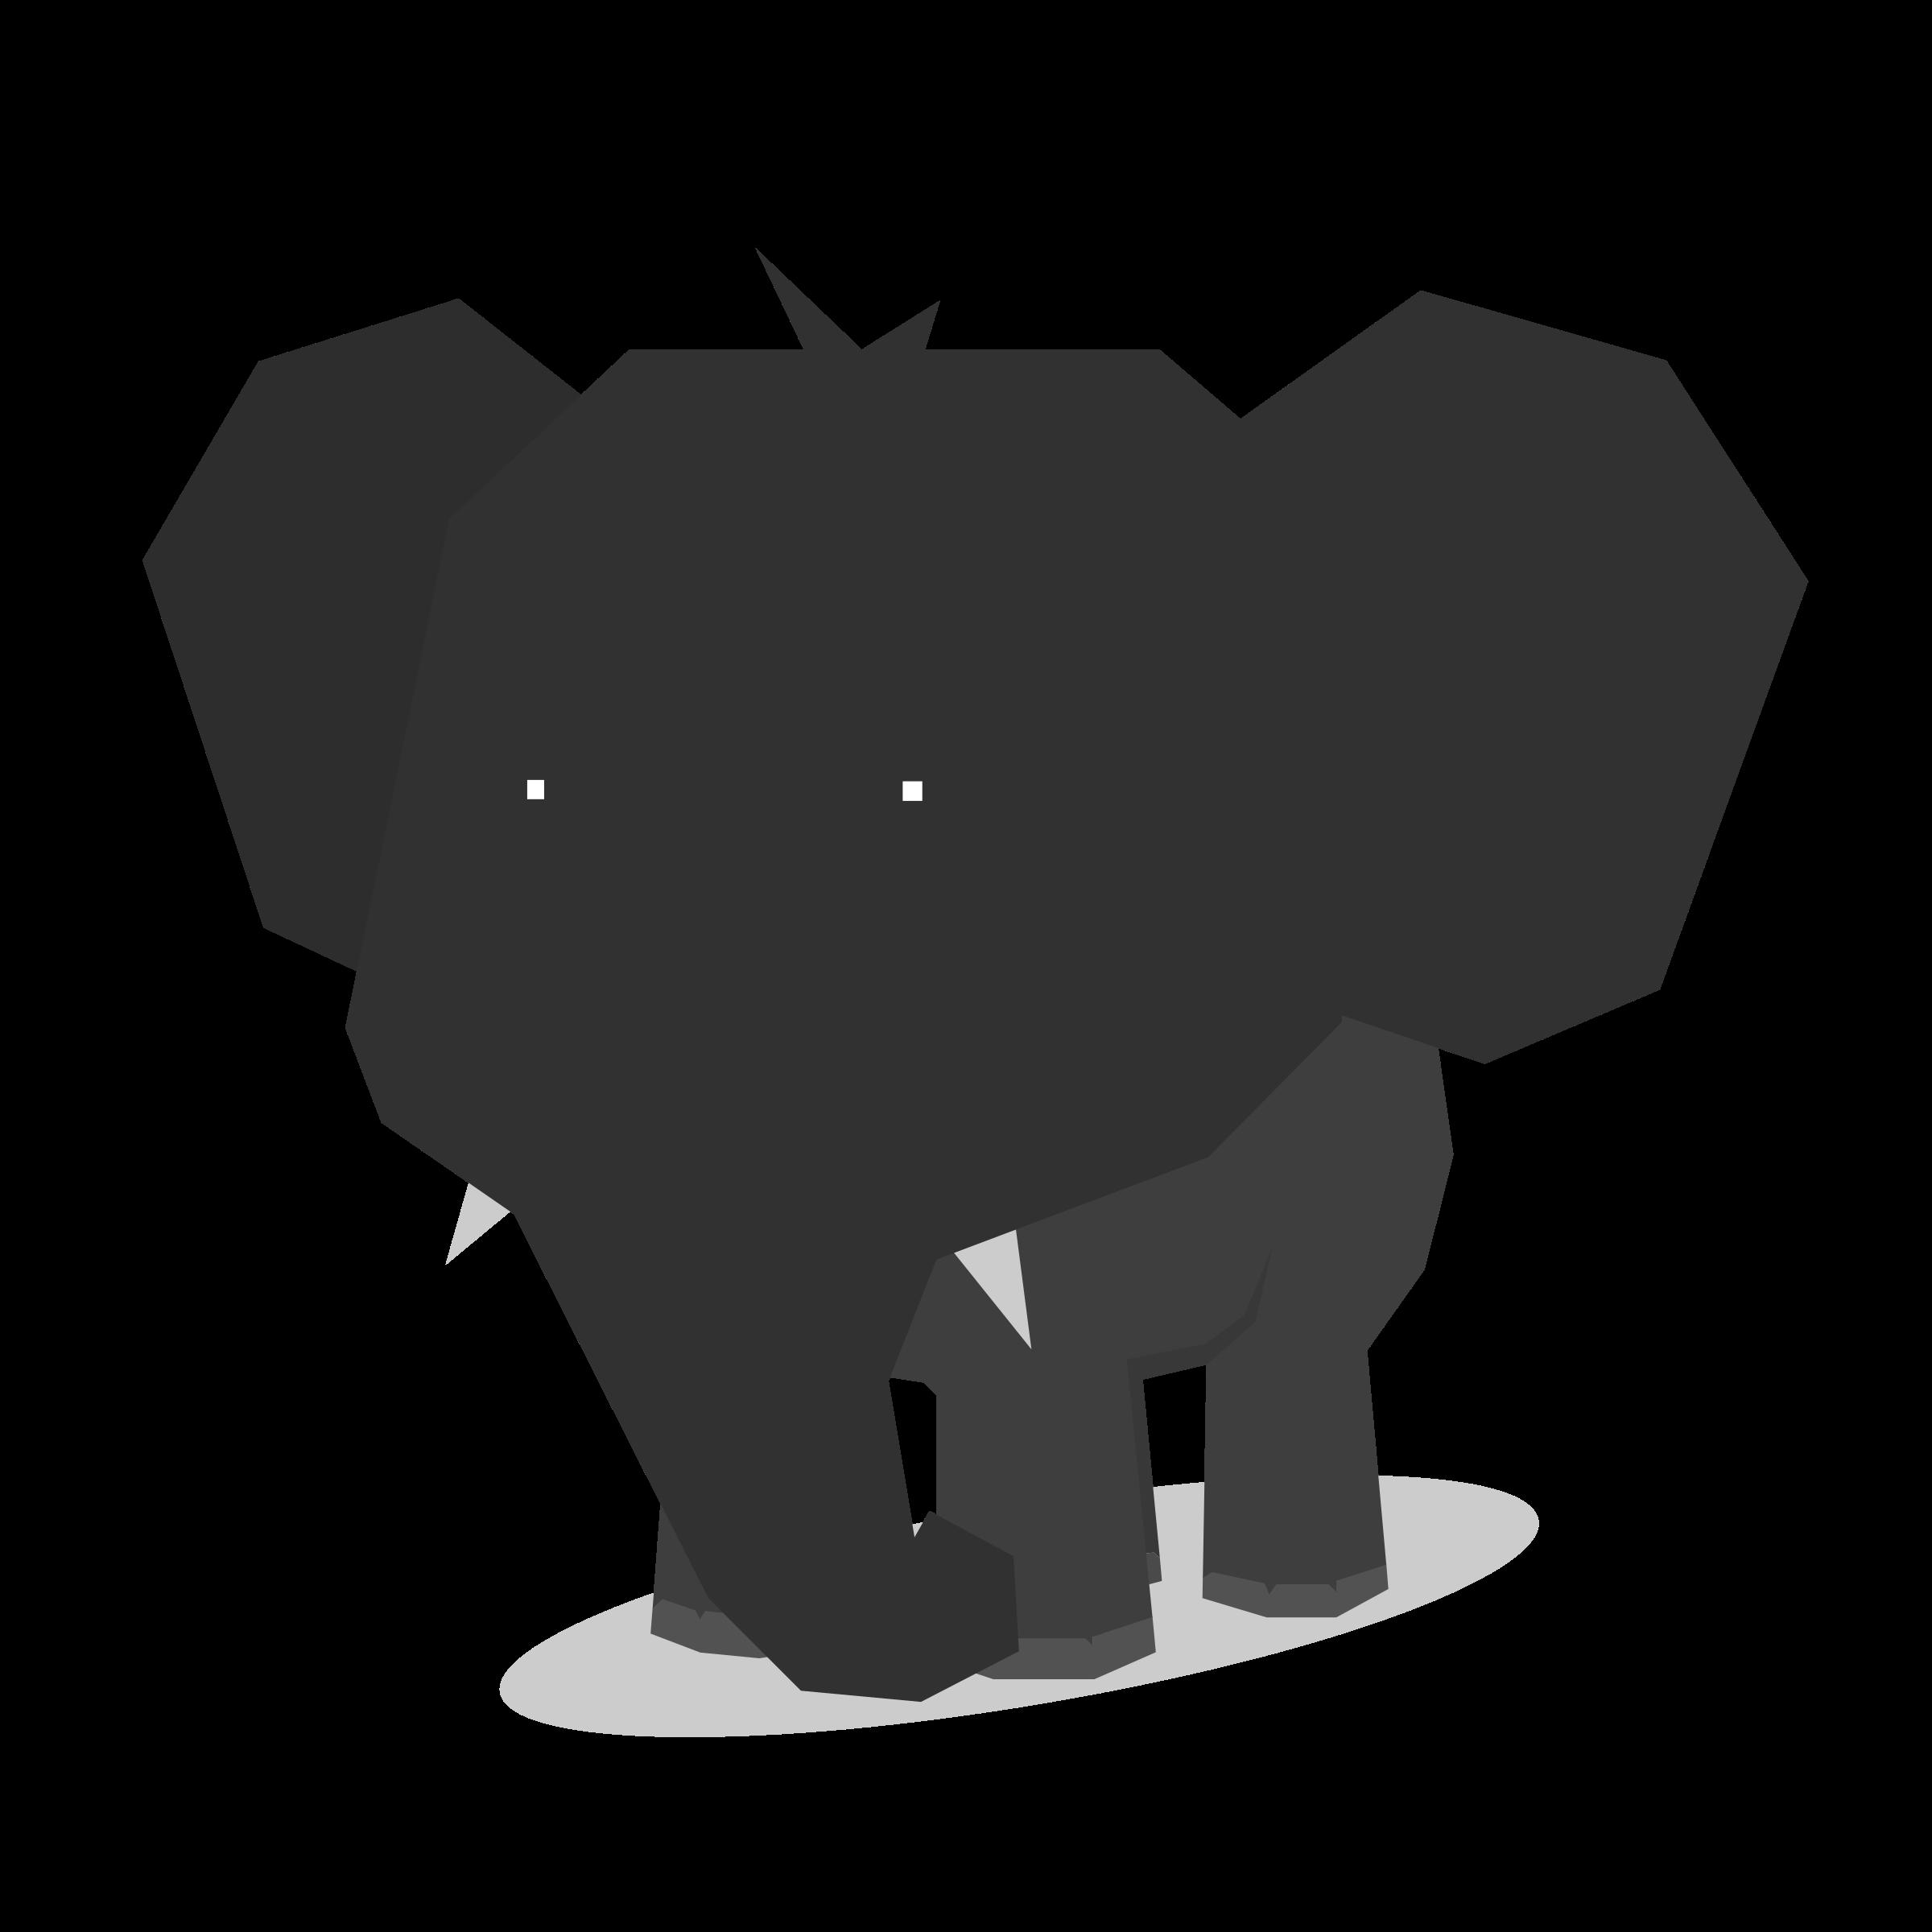 Hearts clipart elephant. Minimal flat design animal